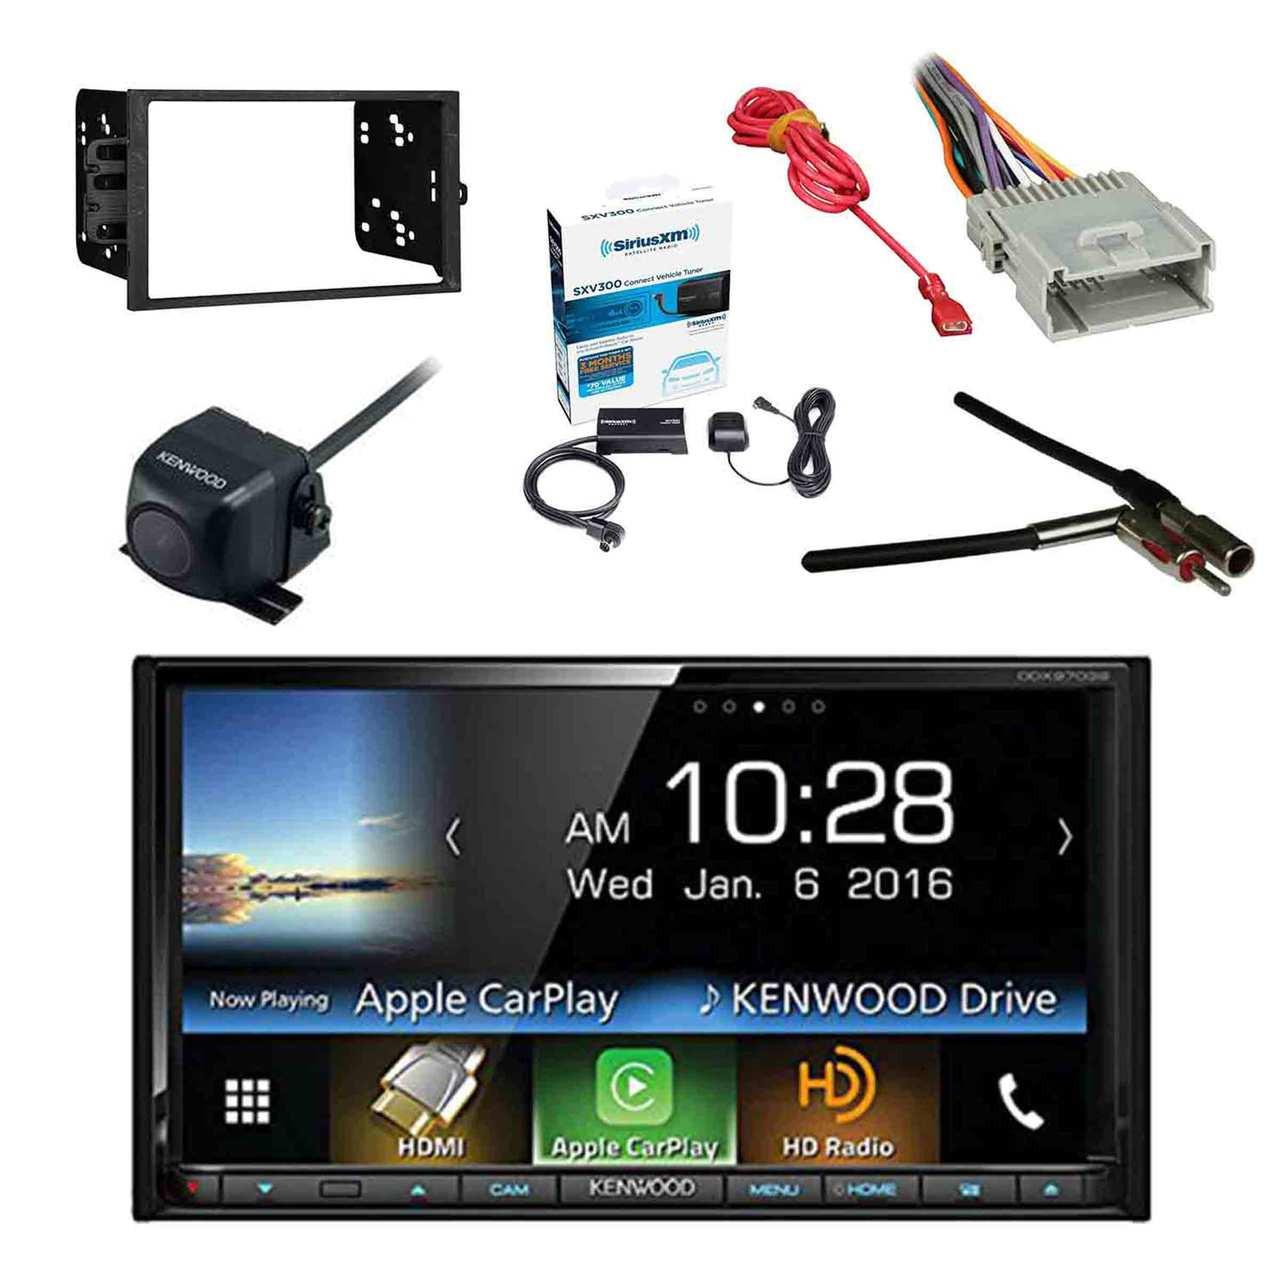 Kenwood DDX9703S 2-DIN DVD/CD/AM/FM Car Stereo Receiver w/Sirius Radio  Tuner, Kenwood Rearview Wide Angle Camera, Metra 2DIN Dash Kit for Radio,  Metra